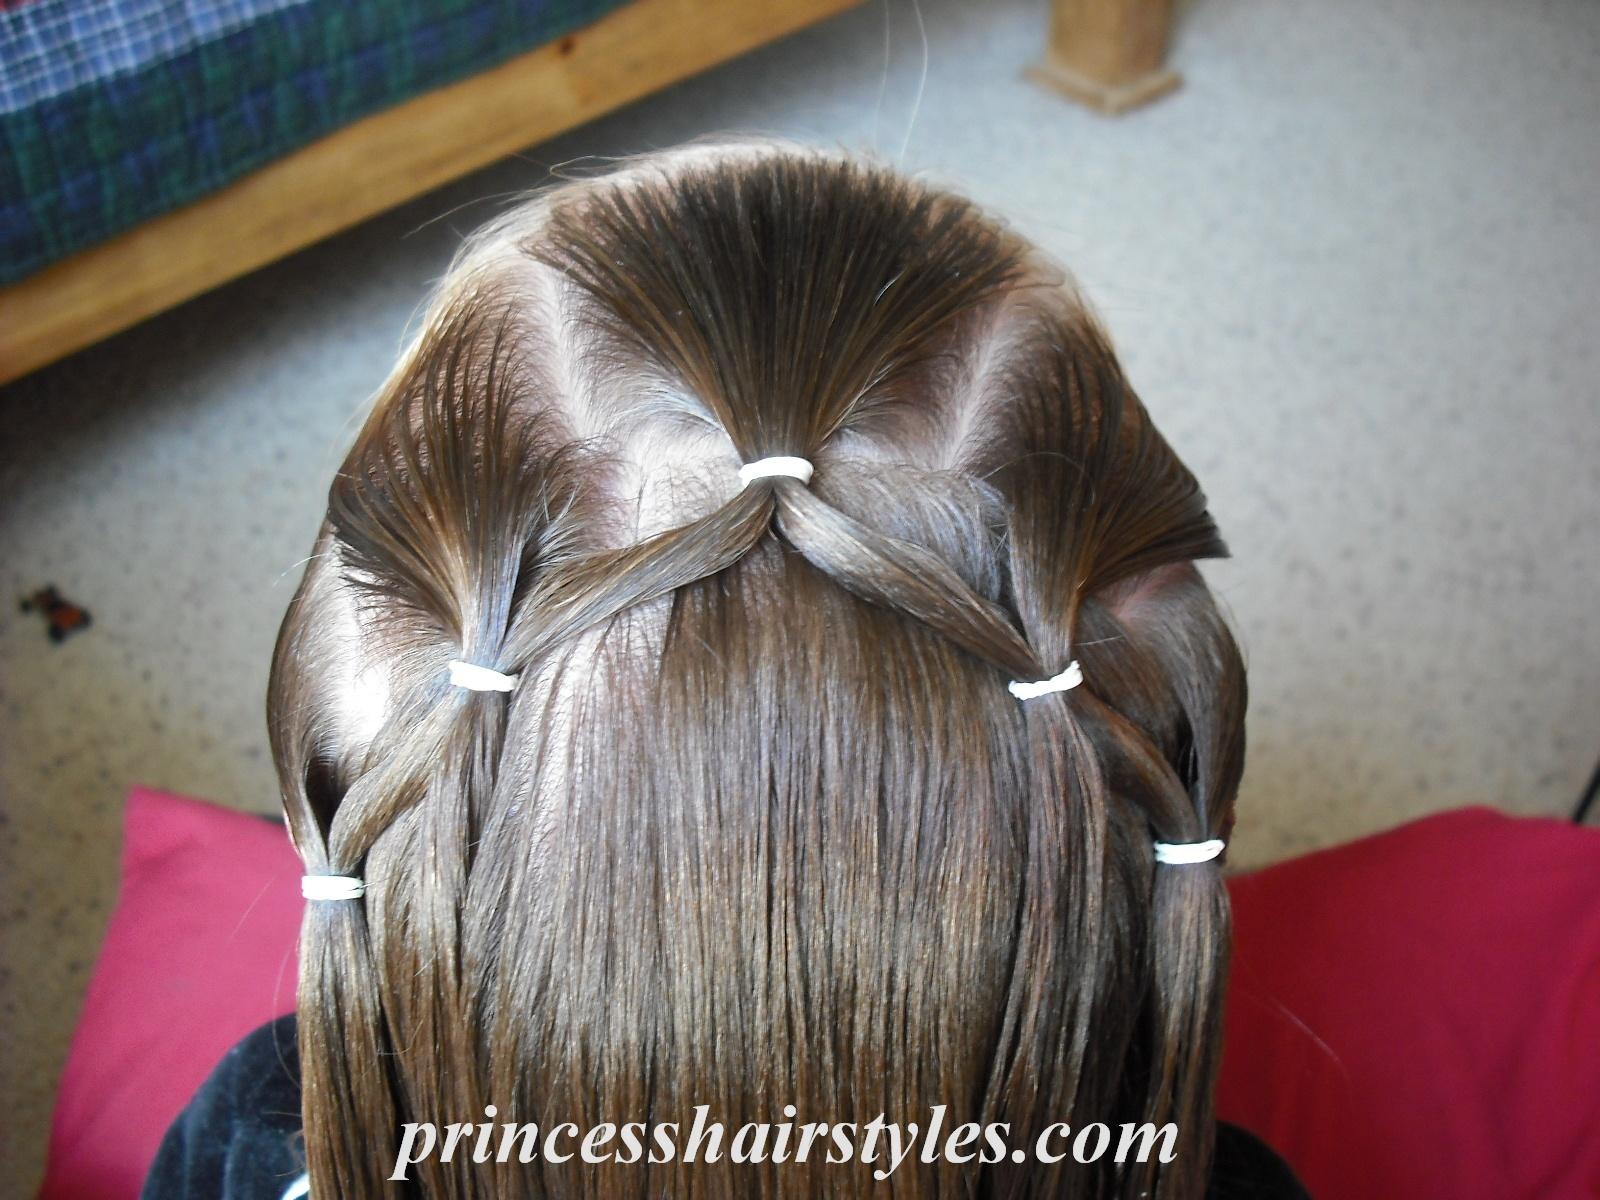 Sensational Flower Girl Hairstyle Hairstyles For Girls Princess Hairstyles Short Hairstyles Gunalazisus